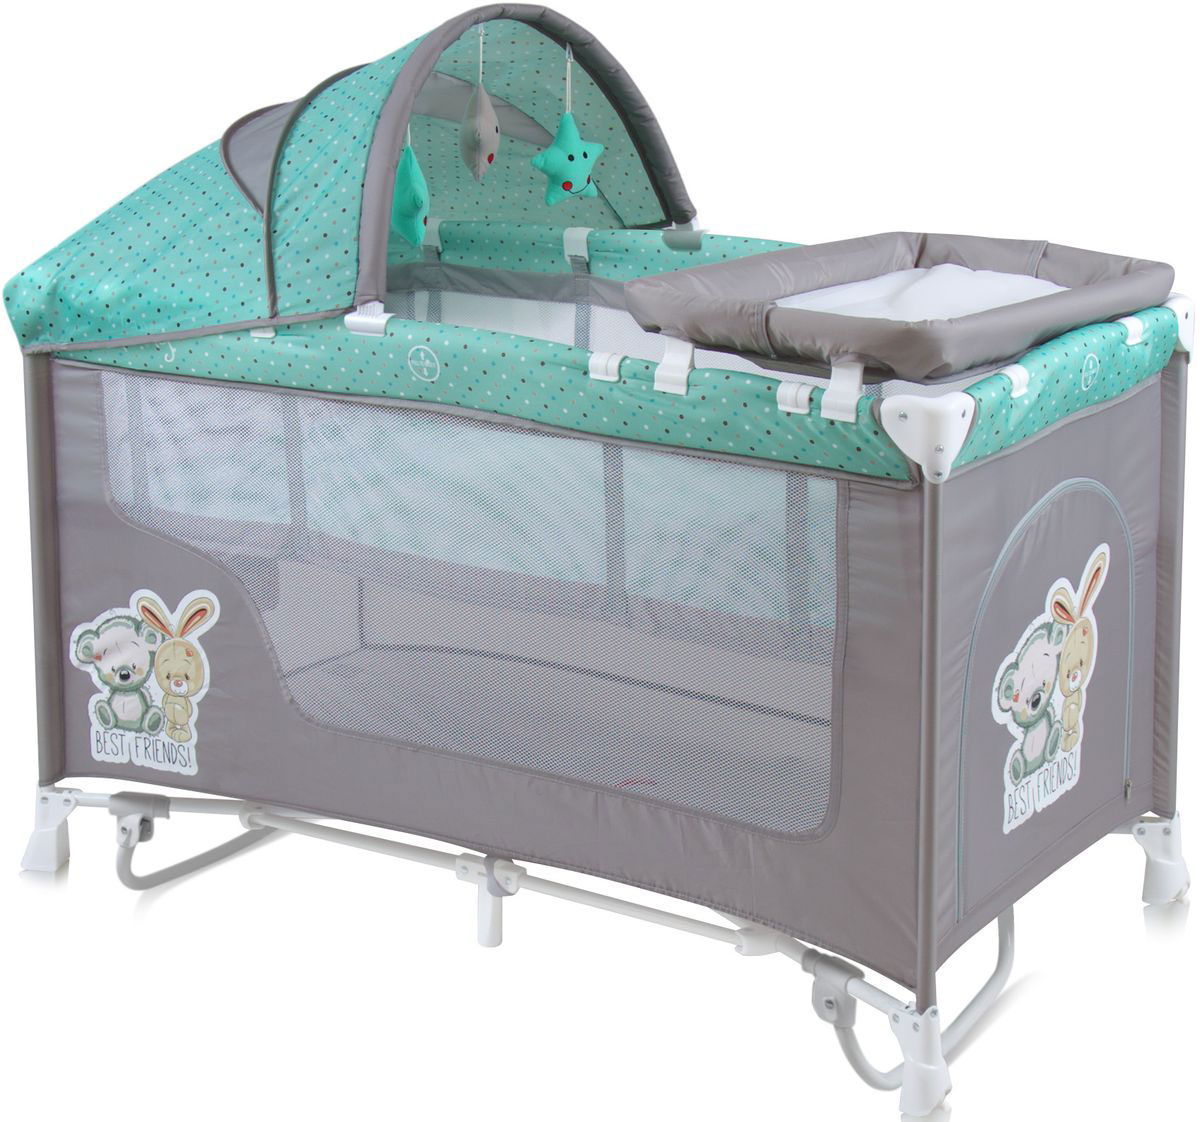 Lorelli Манеж-кроватка Nanny 2 Plus Rocker цвет серый зеленый -  Детская комната